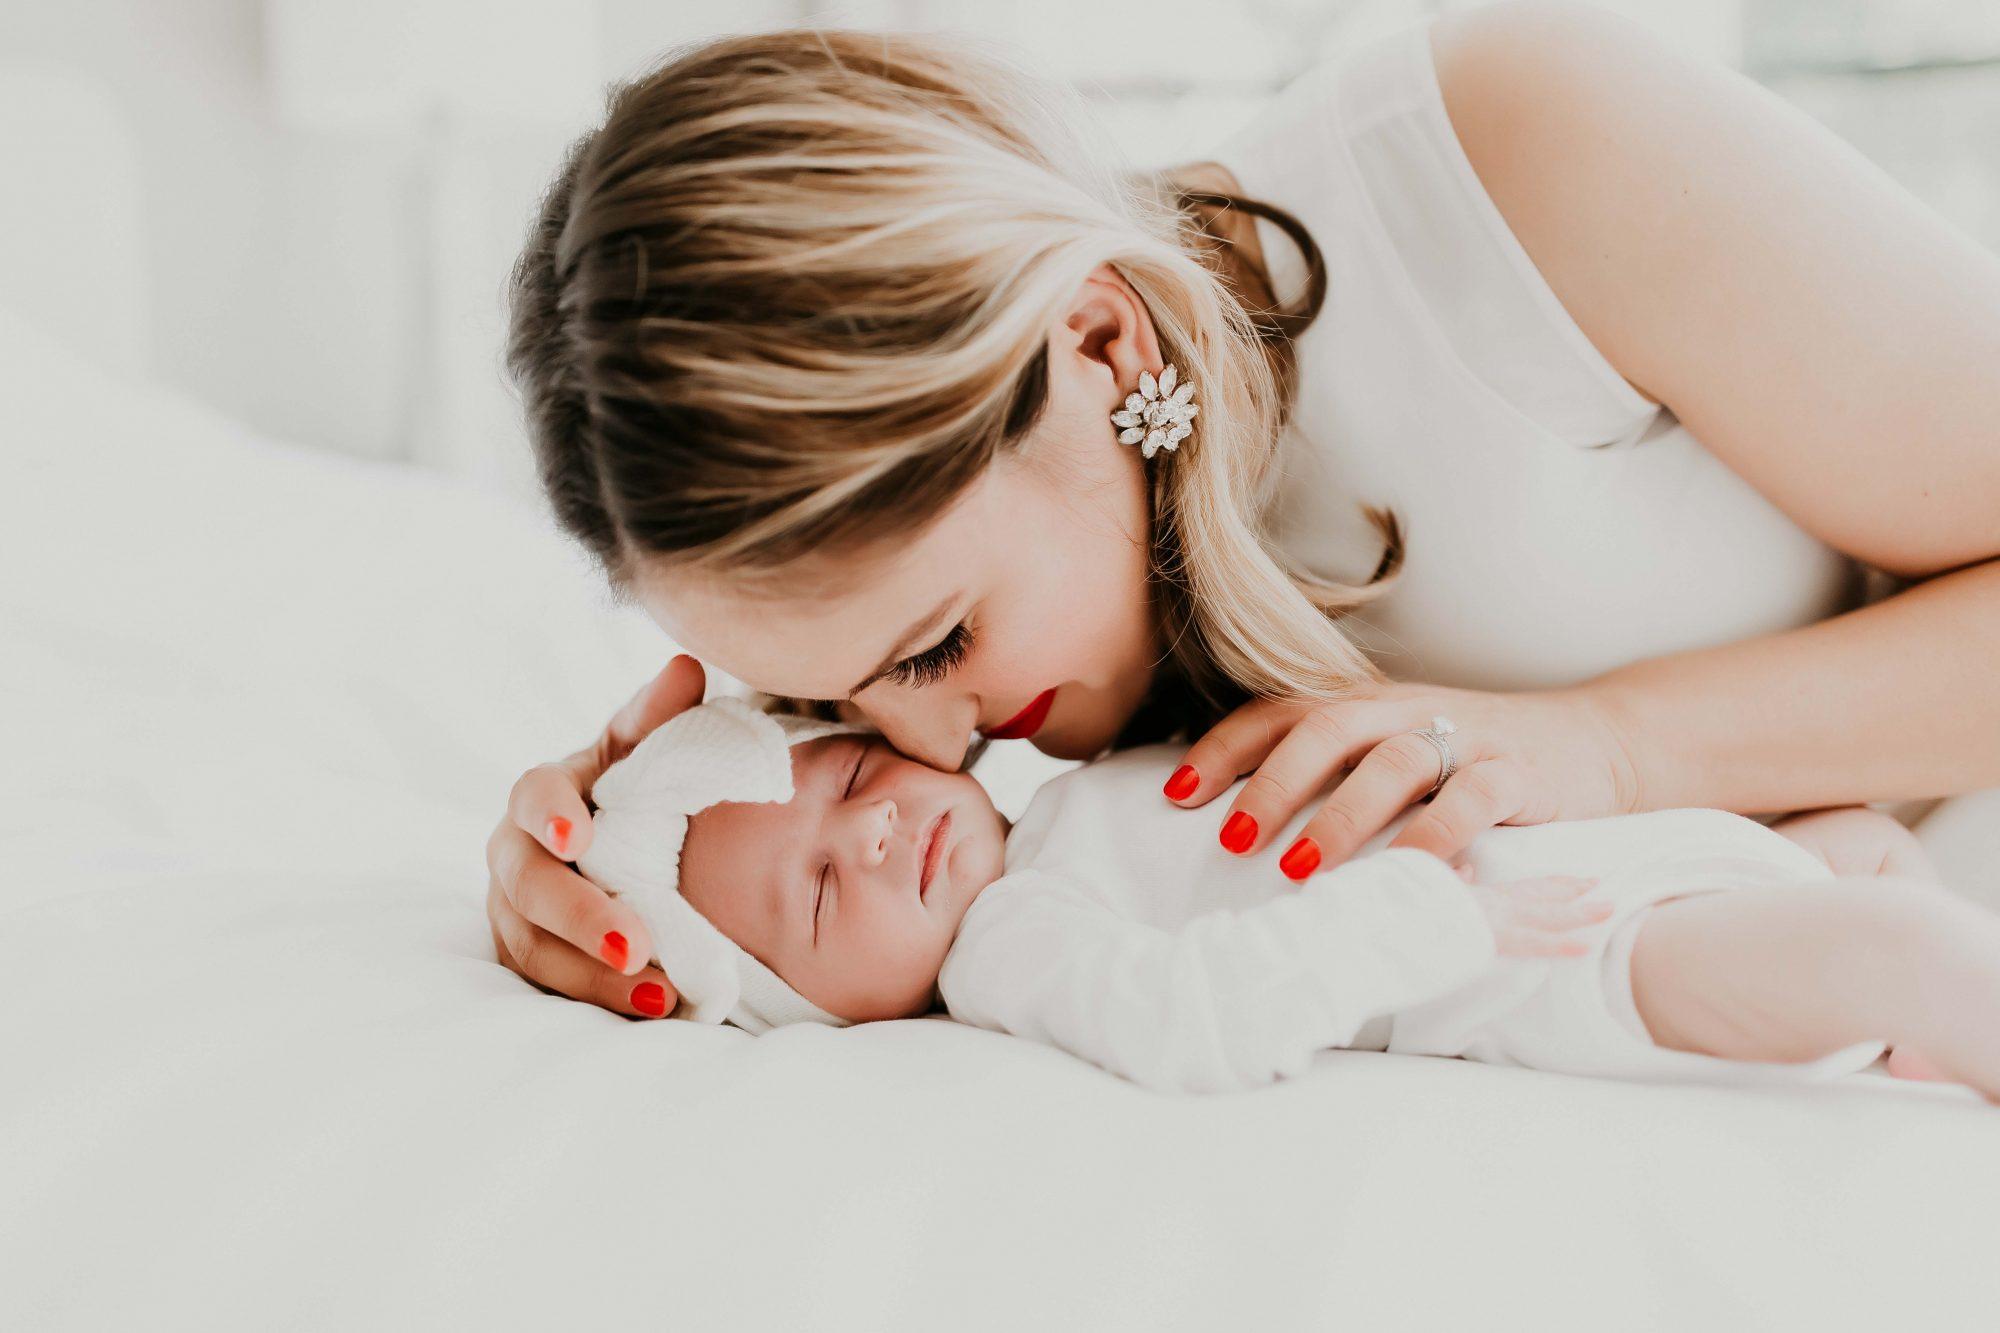 Newborn Photographer in San Francisco - 12